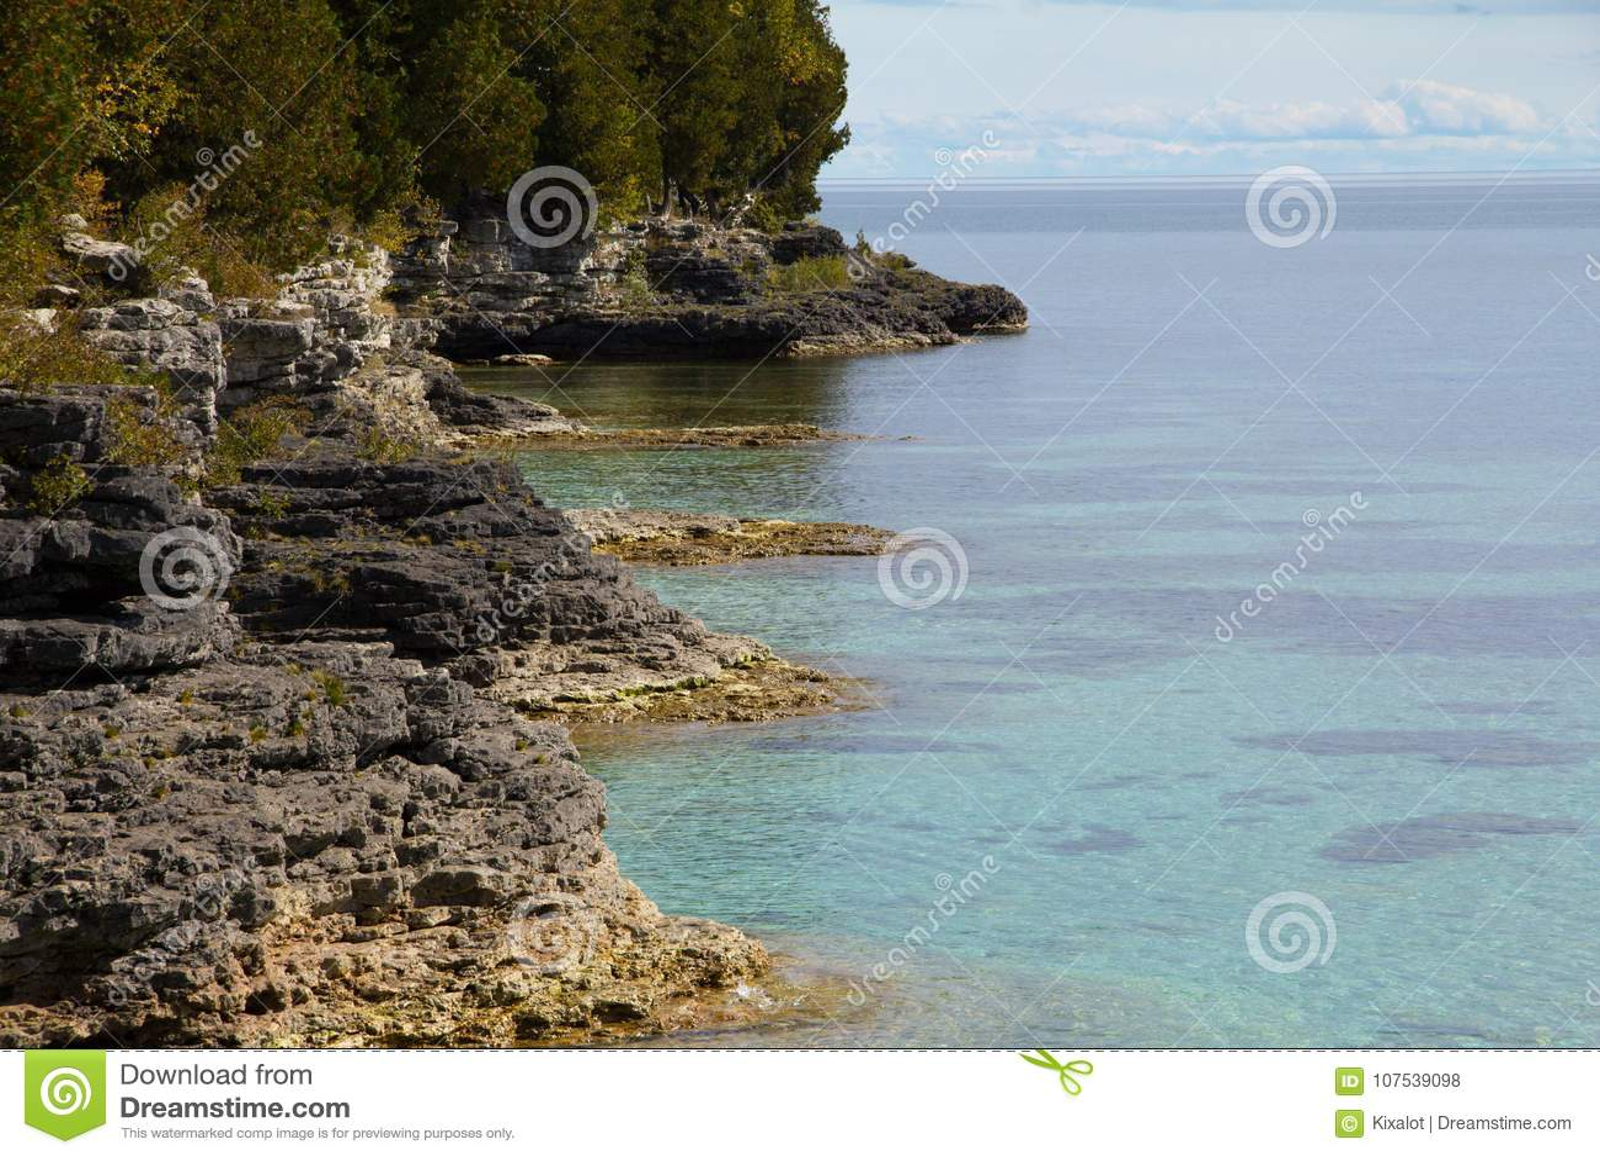 Dolomite Shoreline of Cave Point Park, Door County